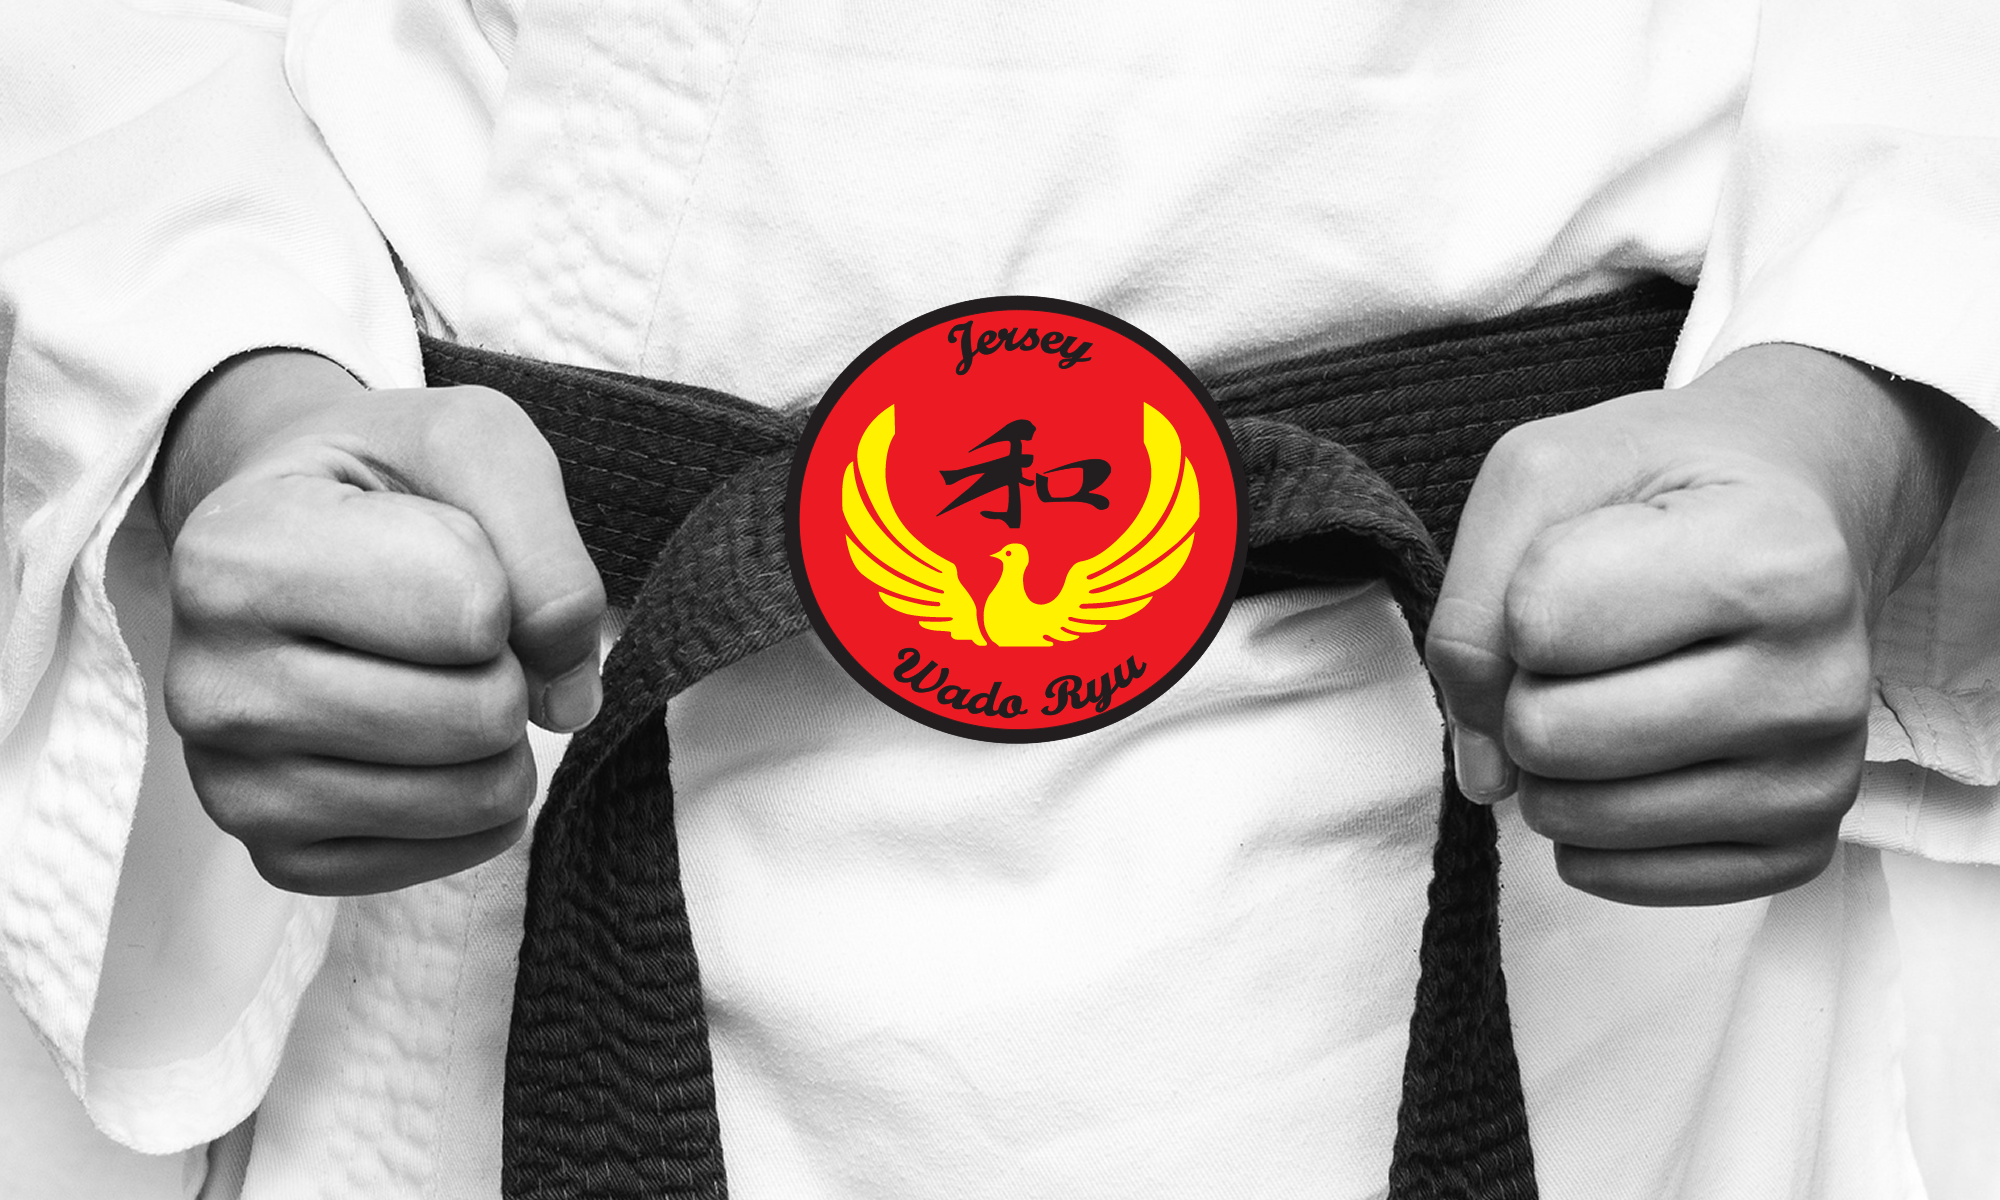 Jersey Wado Ryu